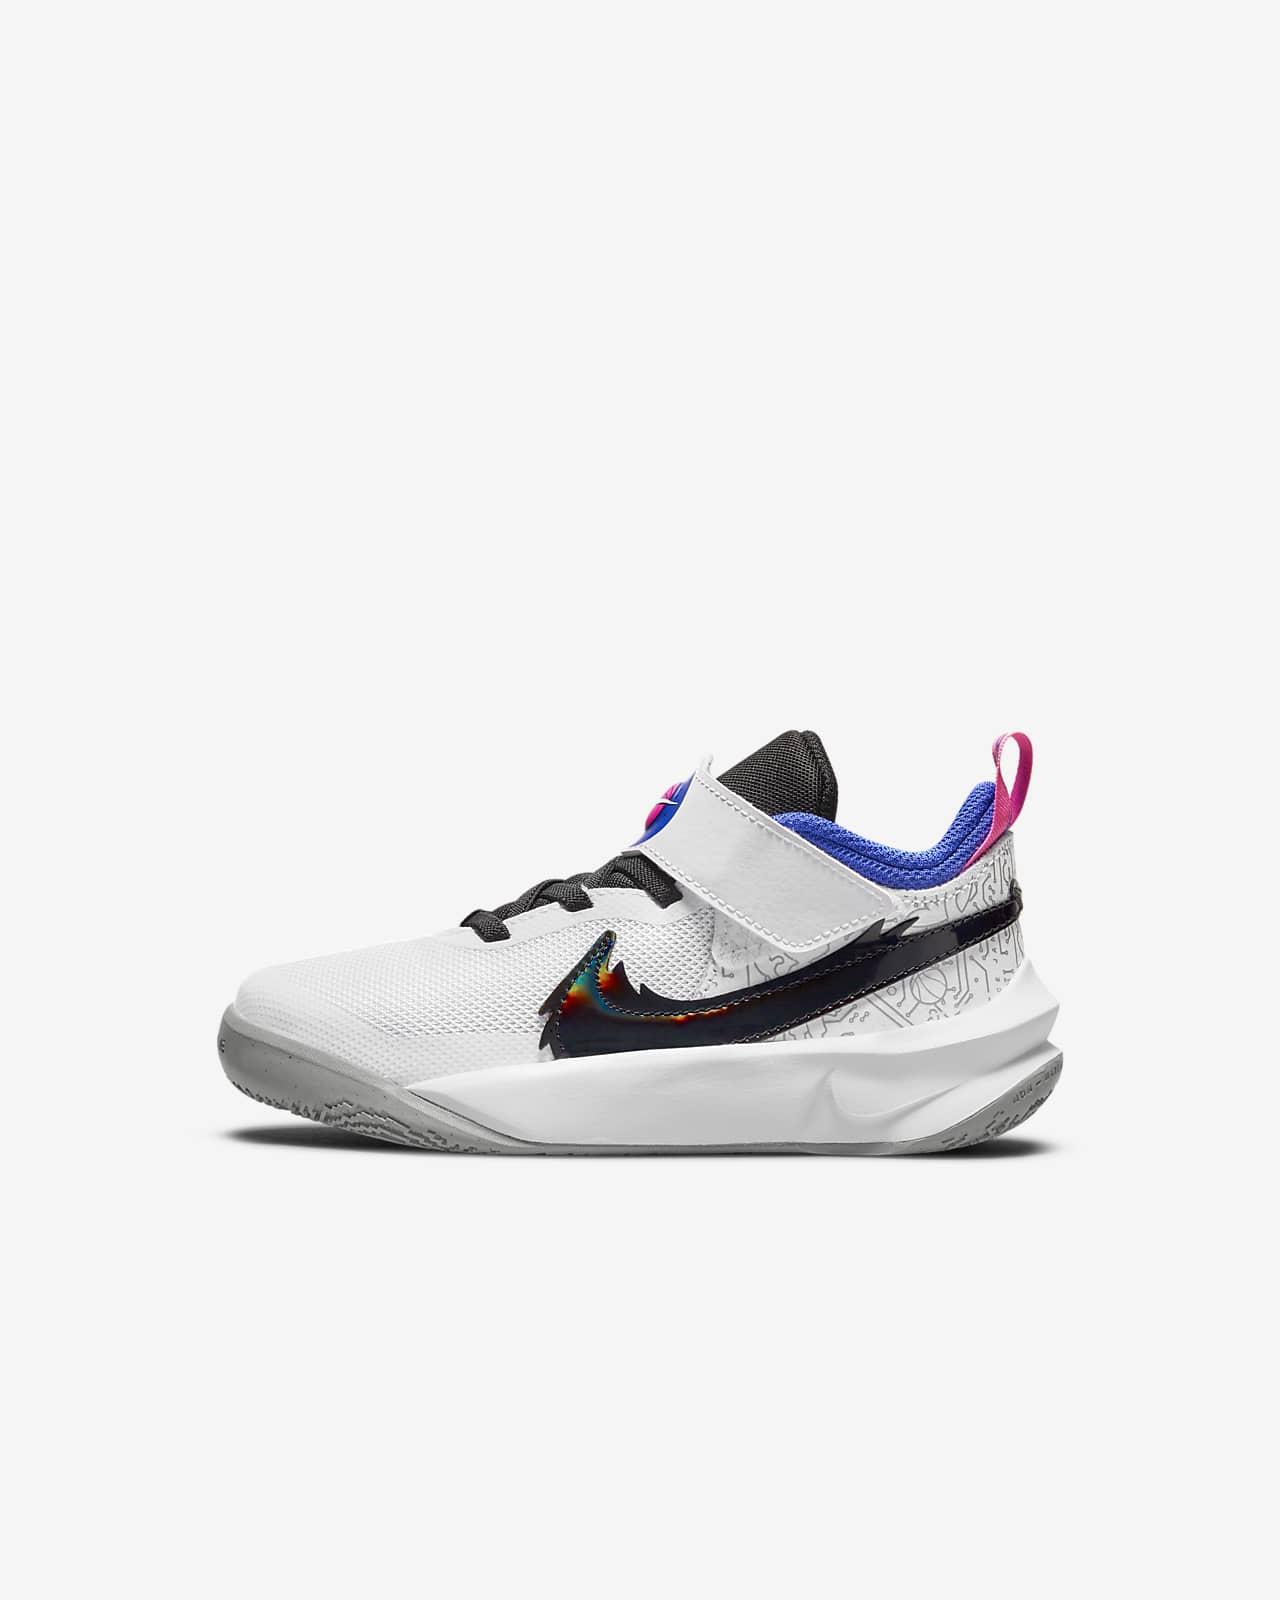 Nike Team Hustle D 10 SE x Space Jam: A New Legacy Little Kids' Shoes